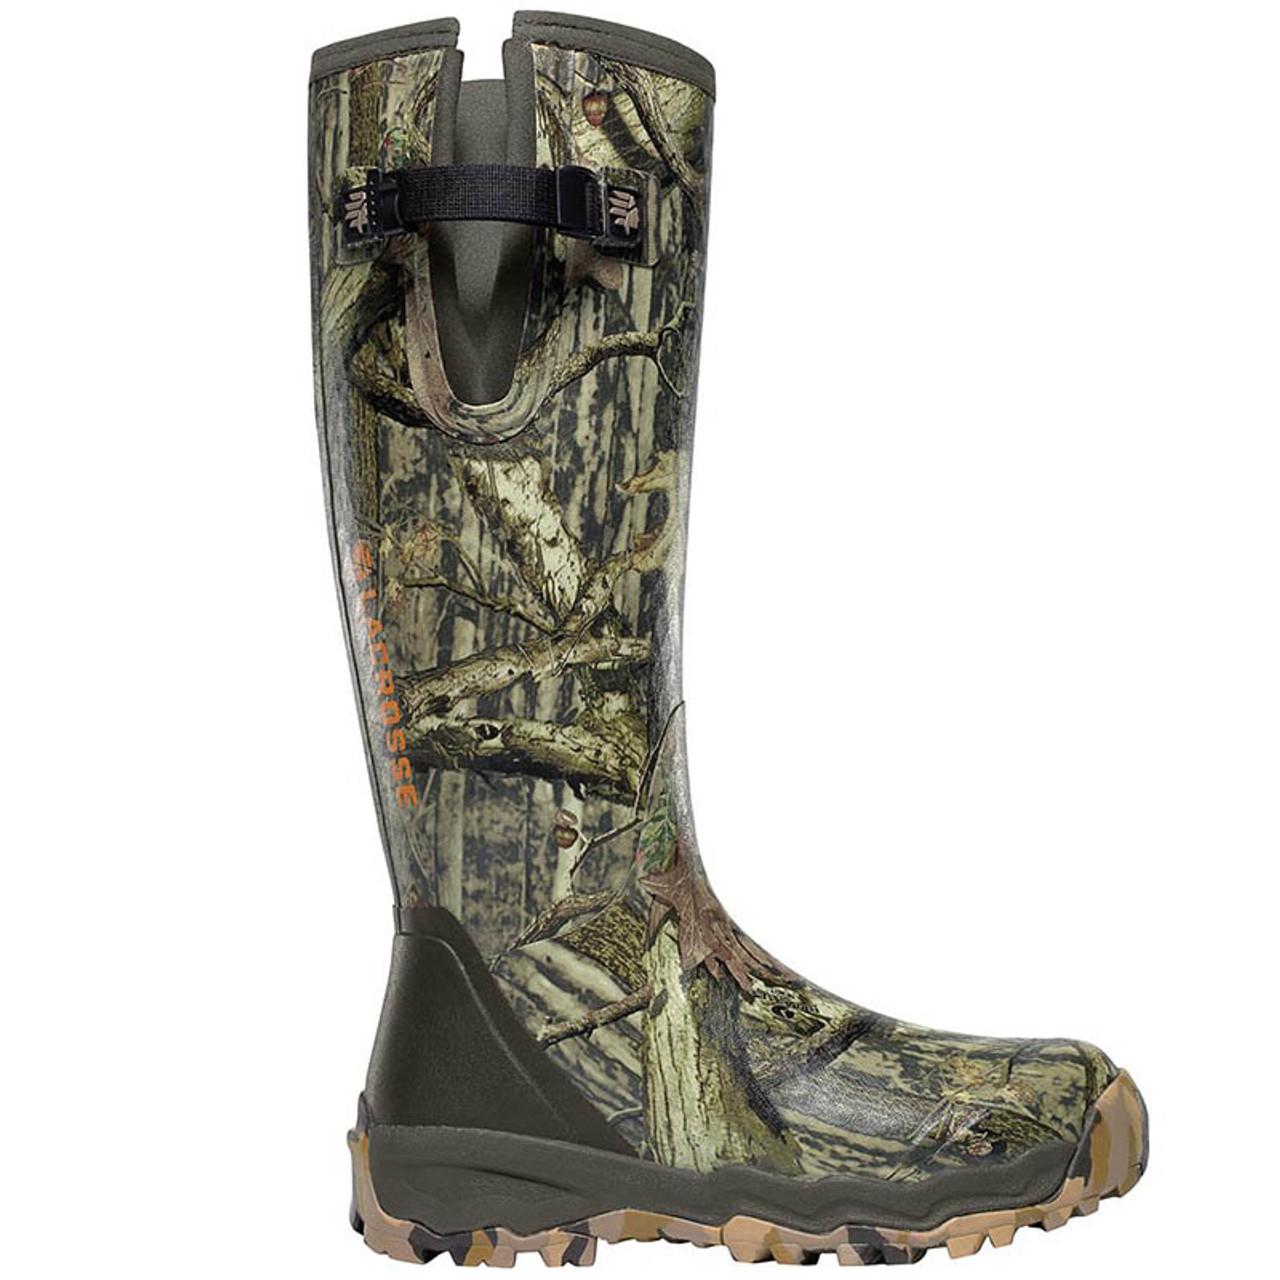 021b0be7e2d LaCrosse 376017 ALPHABURLY PRO SIDE-ZIP 1000g RealTree Camo Hunting Boots